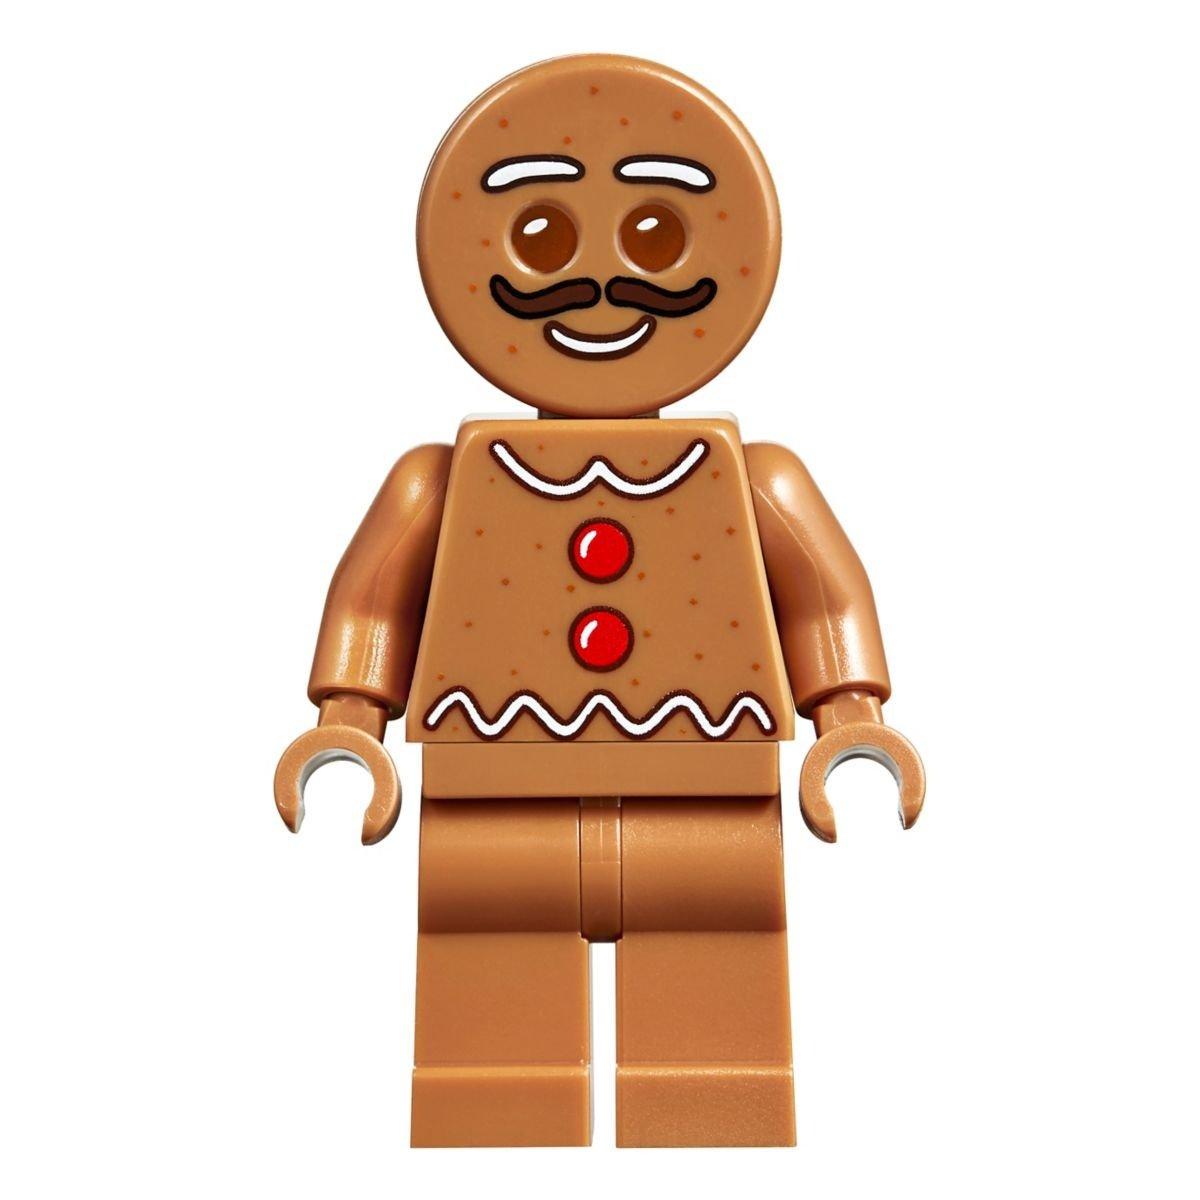 lego-creator-expert-10267-gingerbreadhouse-0020